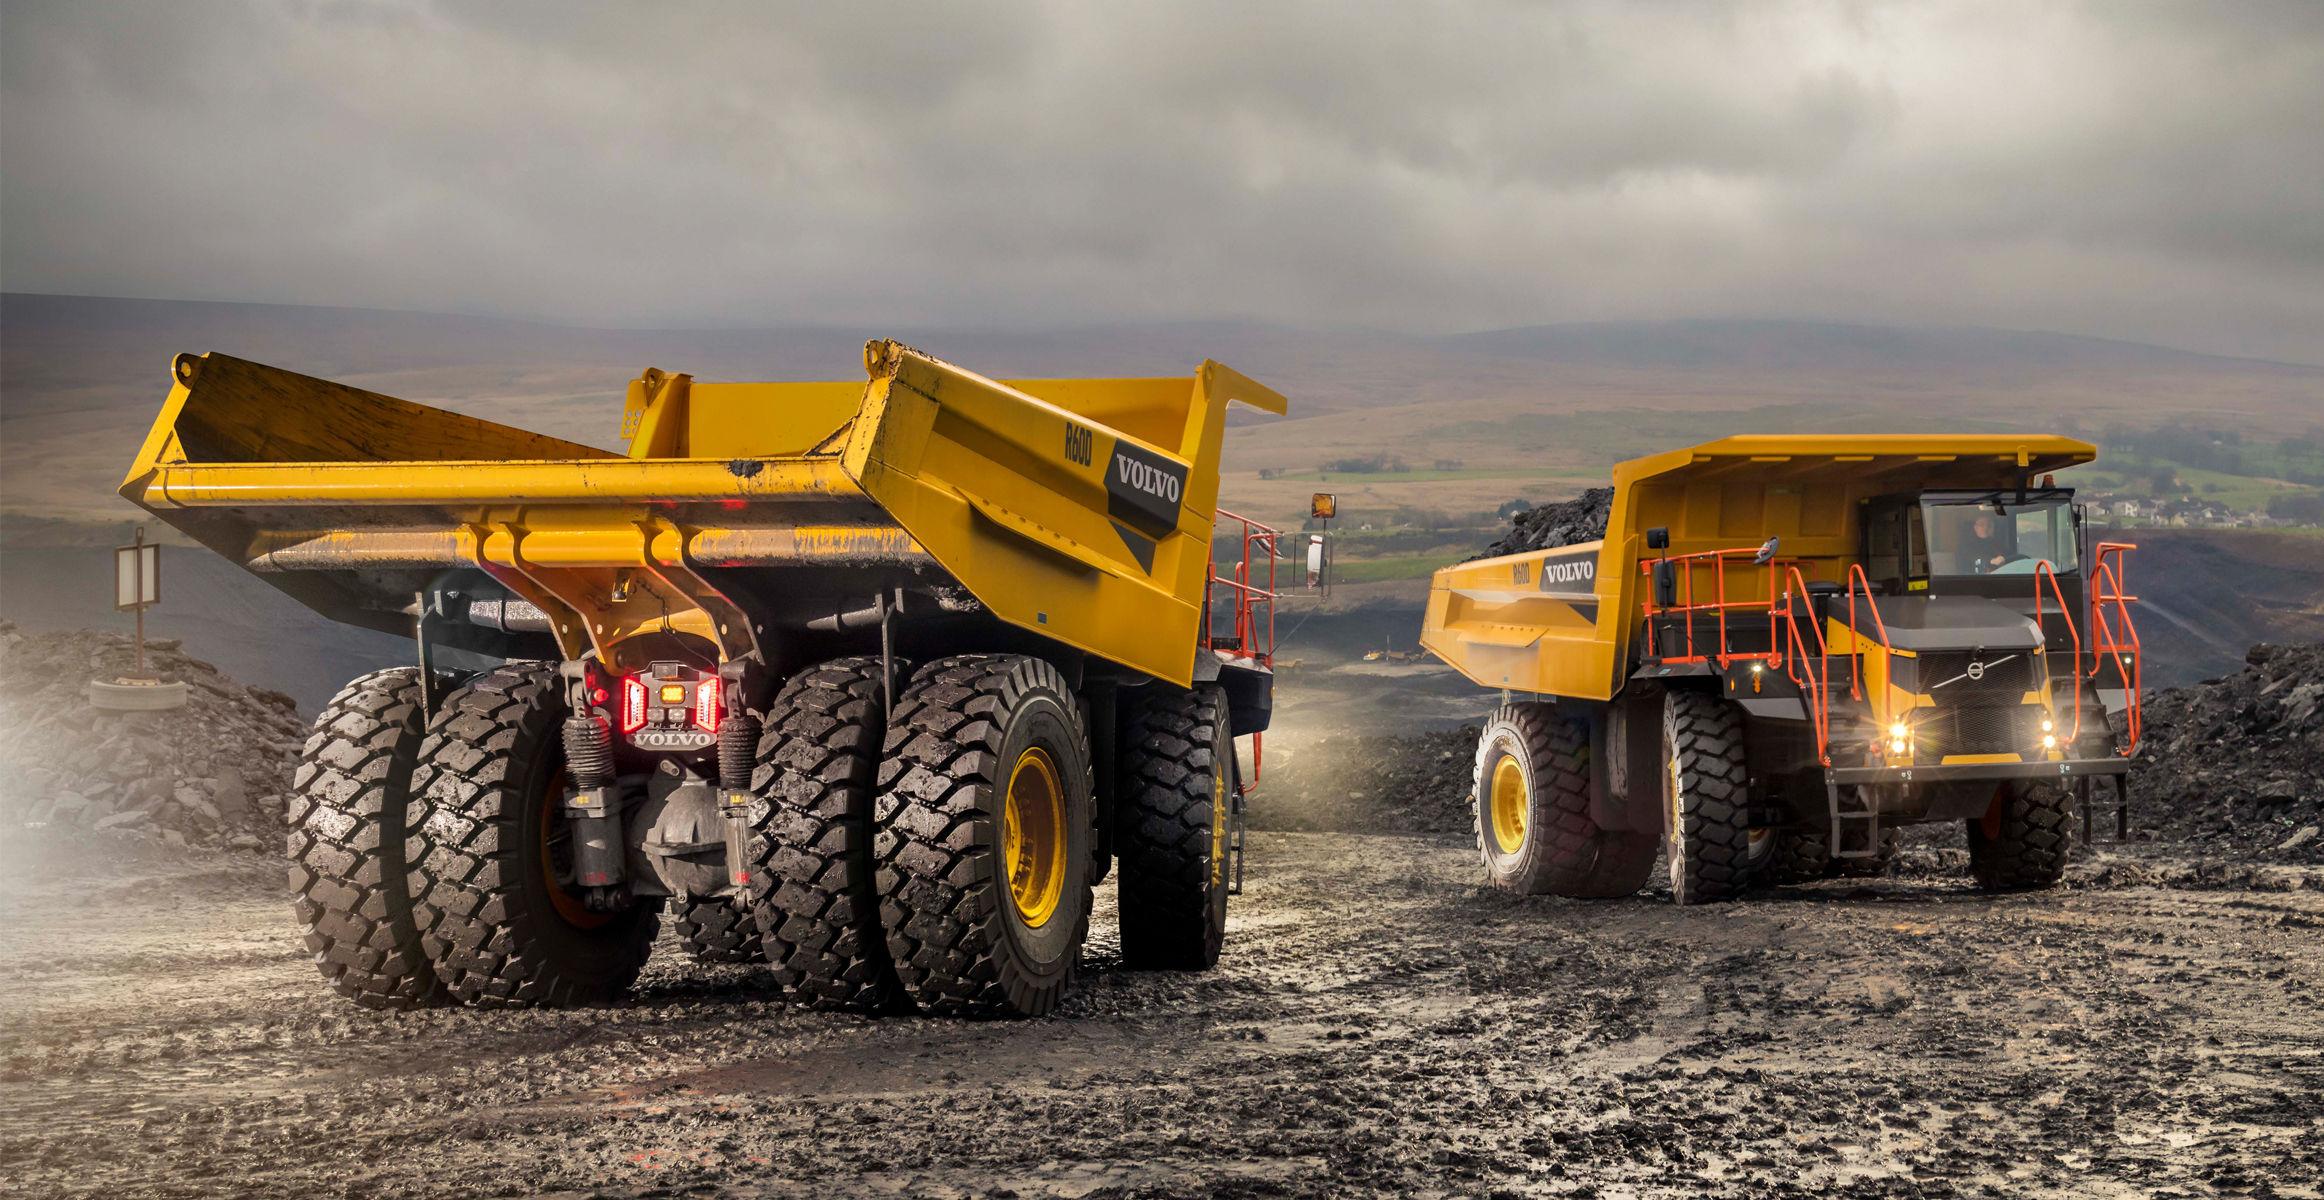 volvo-launches-own-range-of-rigid-haulers-02-2324x1200